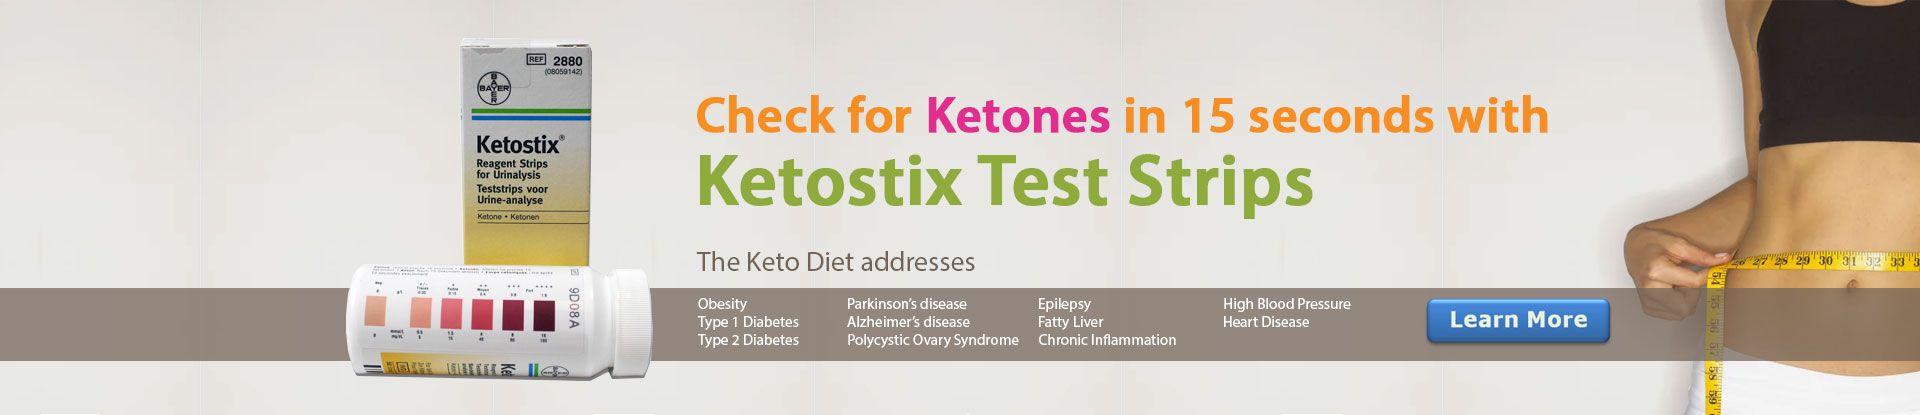 Ketostix Ketosis Test Strips